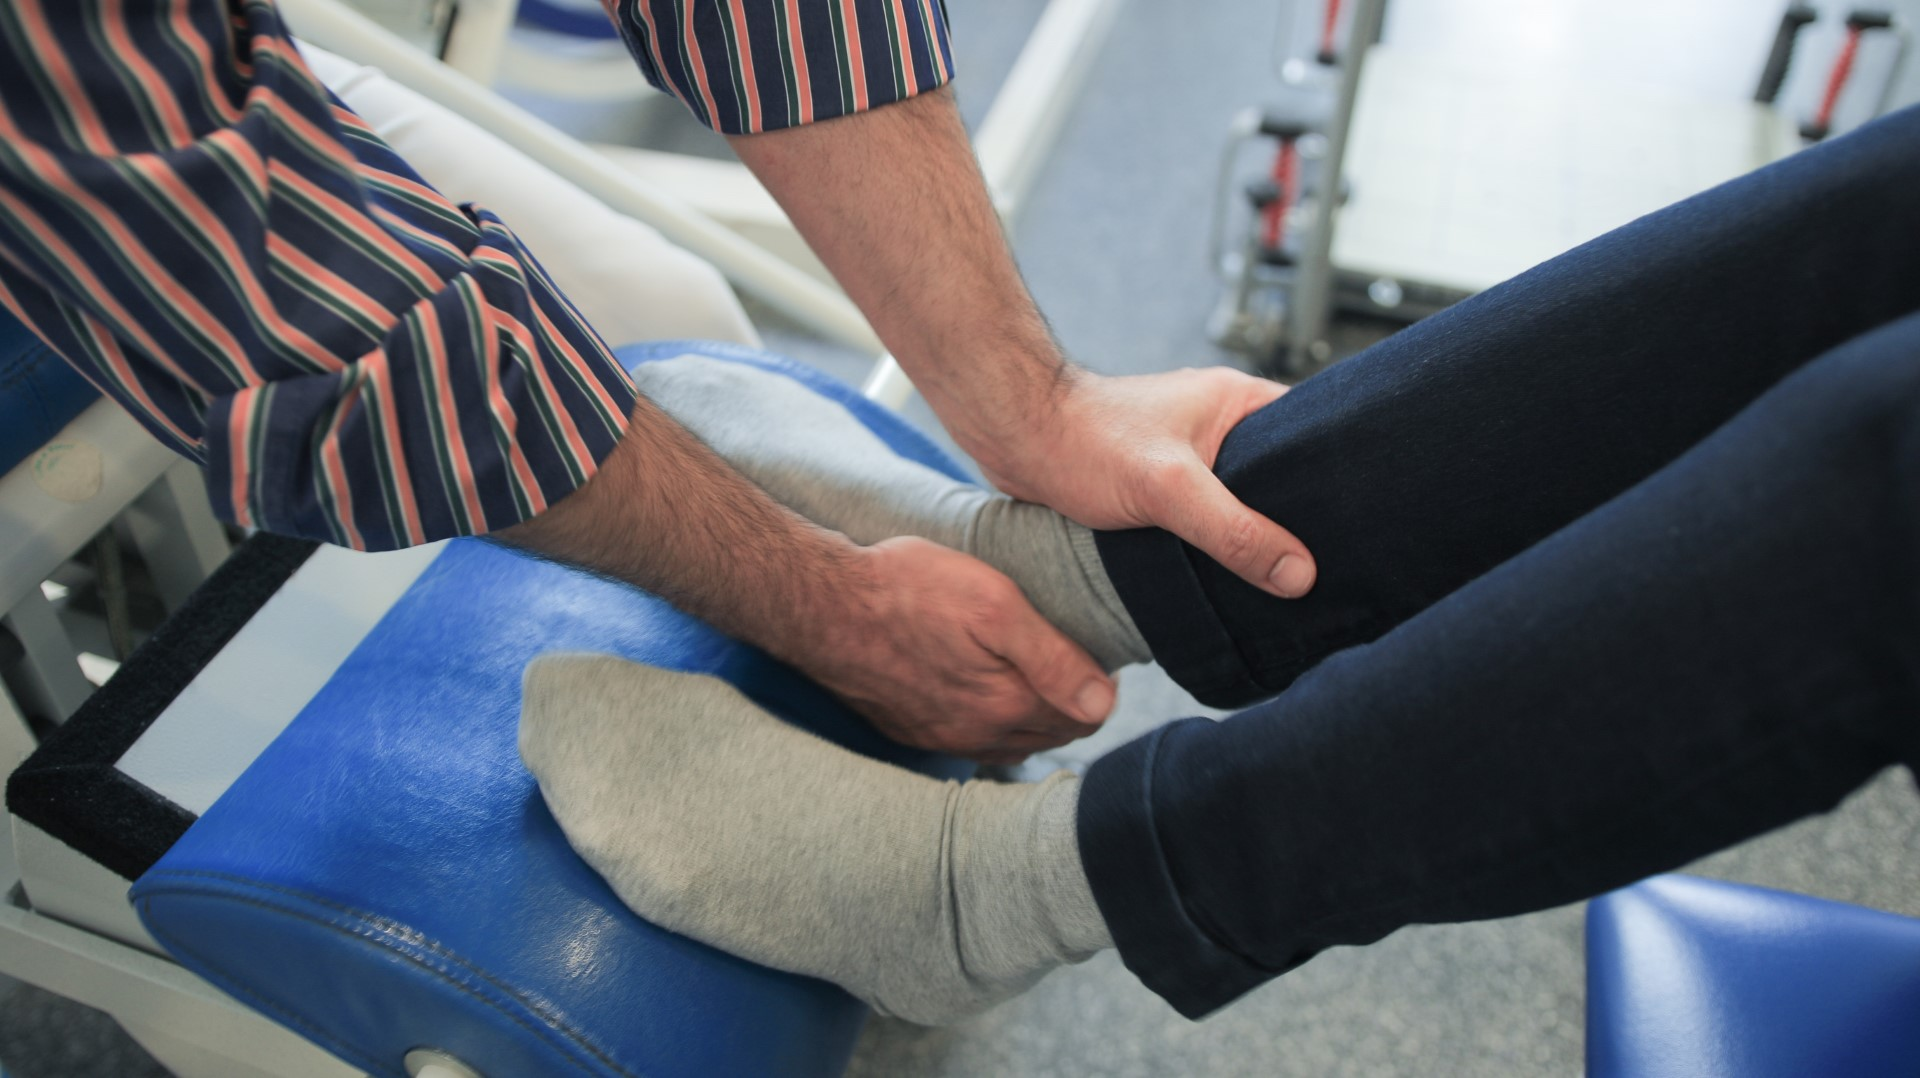 Physikalische und apparative Medizin - Biomechanische Stimulation (BMS) (Vibrationssystem)